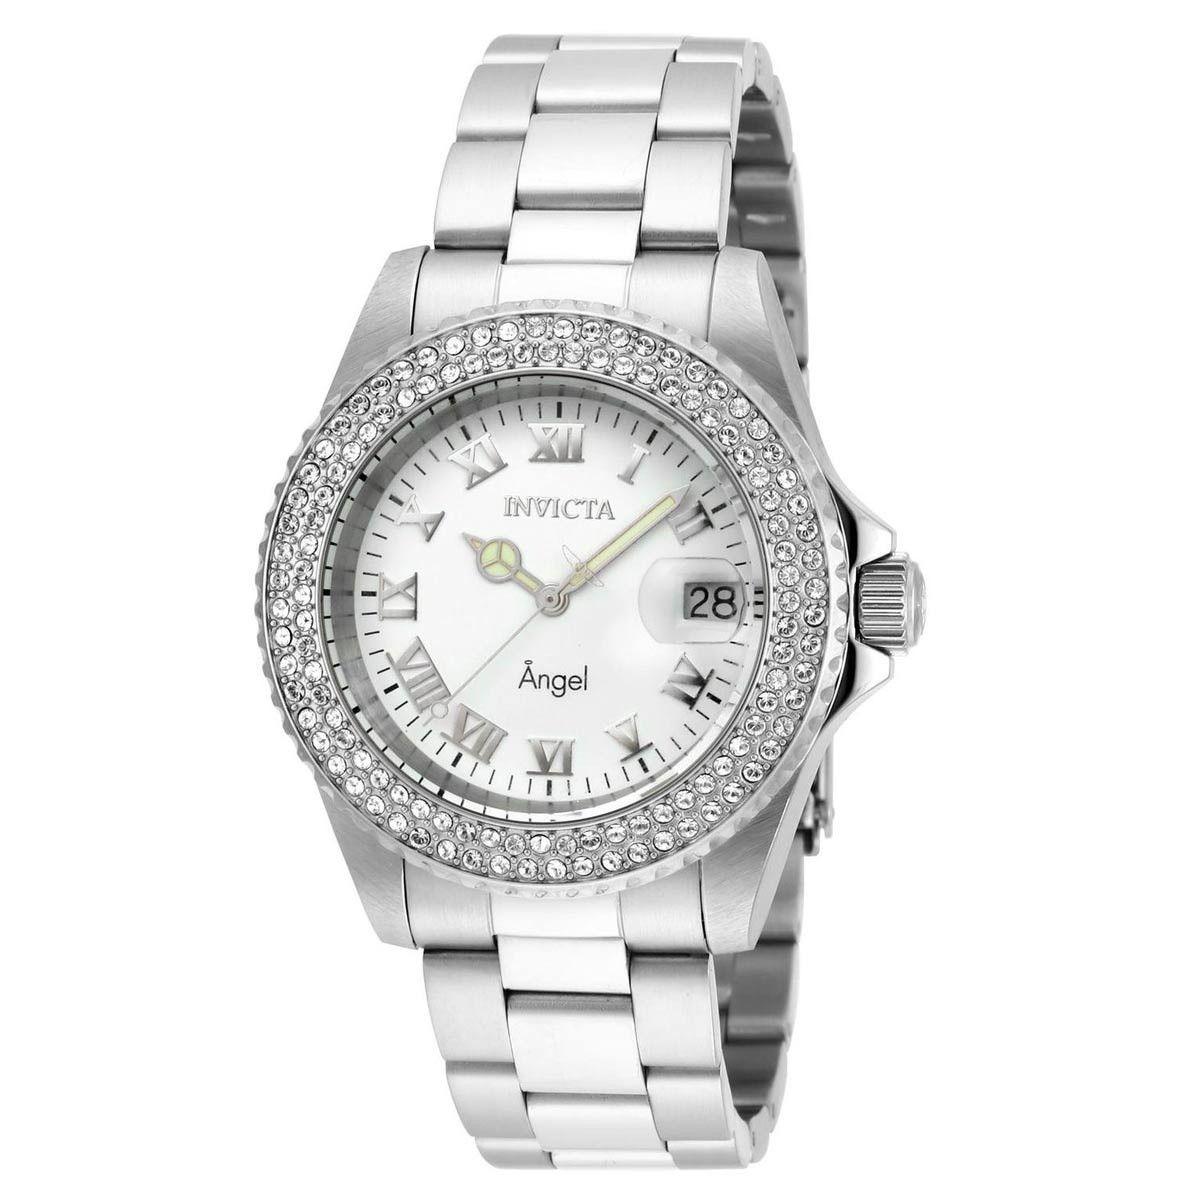 Invicta 20502 Women's Angel Crystal Accented Bezel White Dial Steel Bracelet Dive Watch